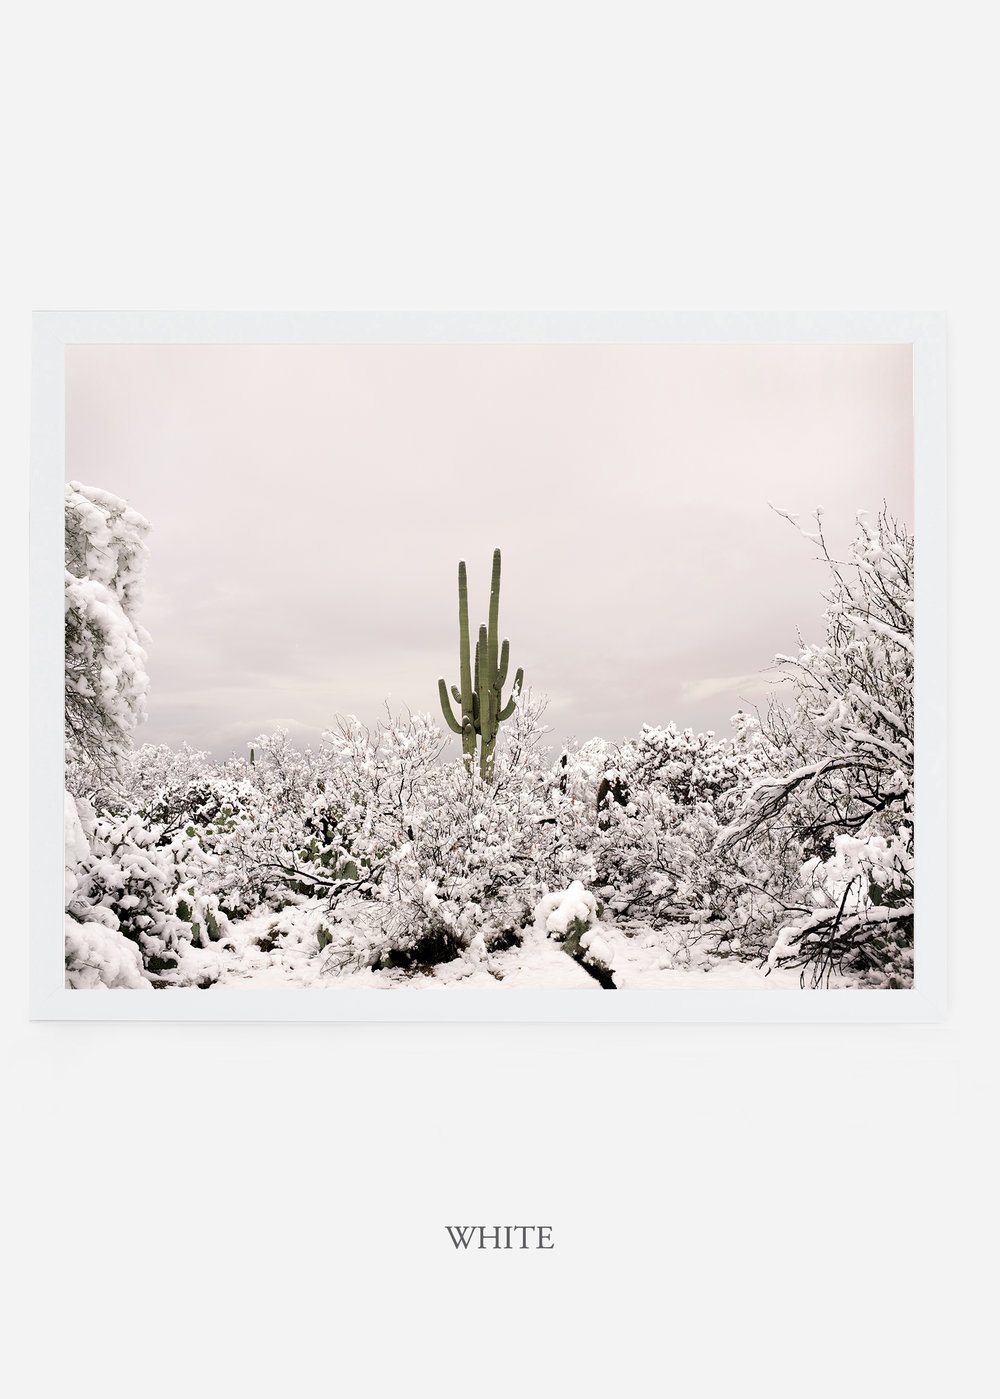 nomat_whiteframe-saguaroNo.1-wildercalifornia-art-wallart-cactusprint-homedecor-prints-arizona-botanical-artwork-interiordesign.jpg